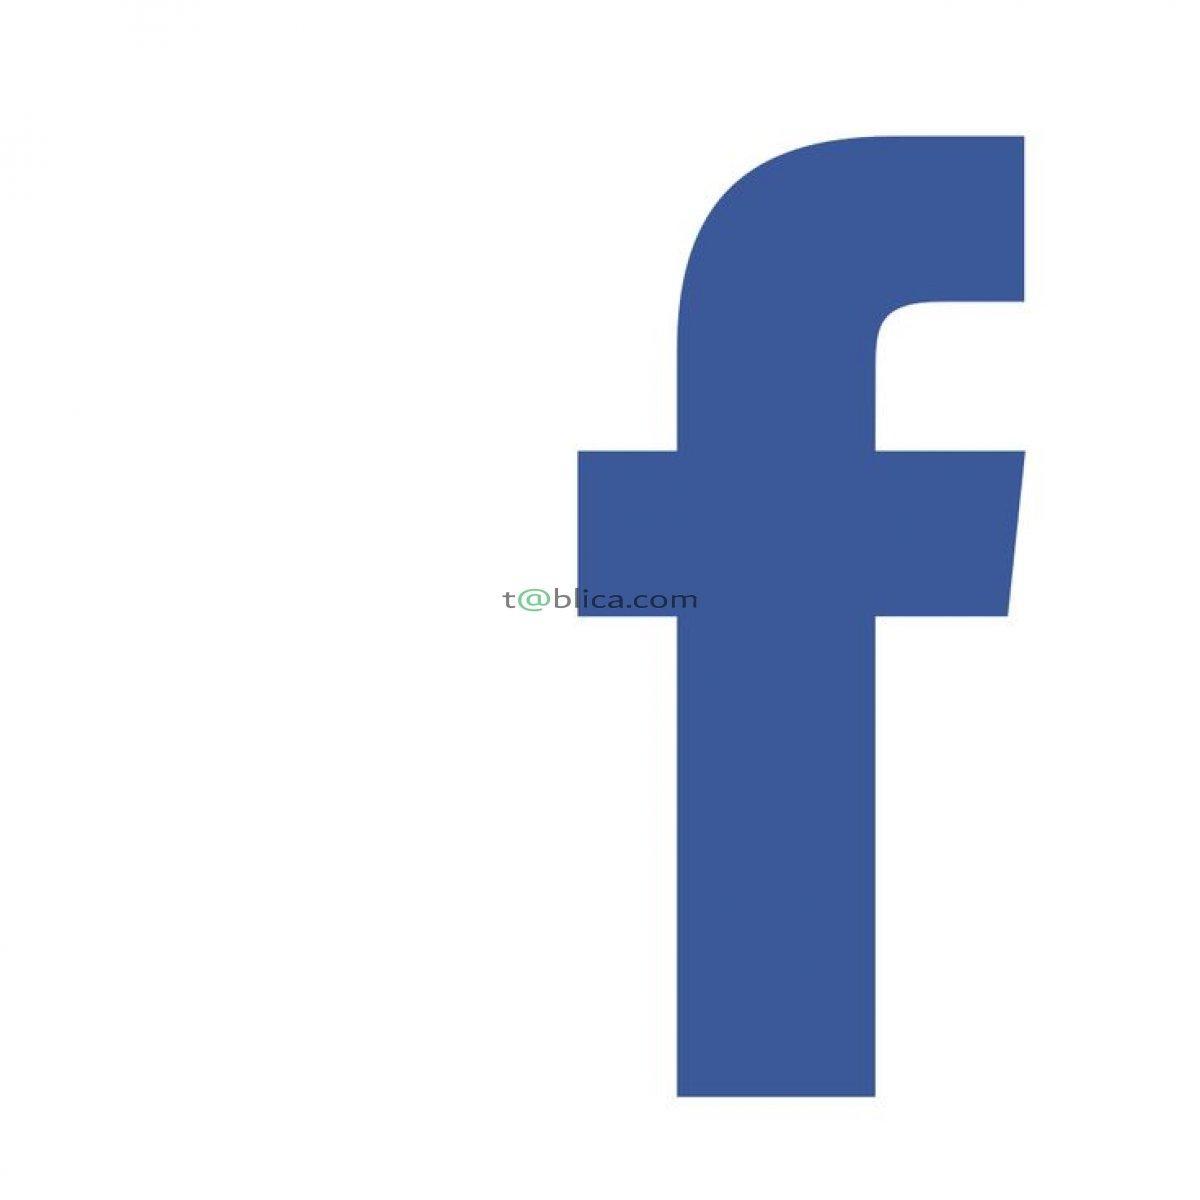 REALNE konto, Profil, Like, Opinie, Rekomendacje, Reklama